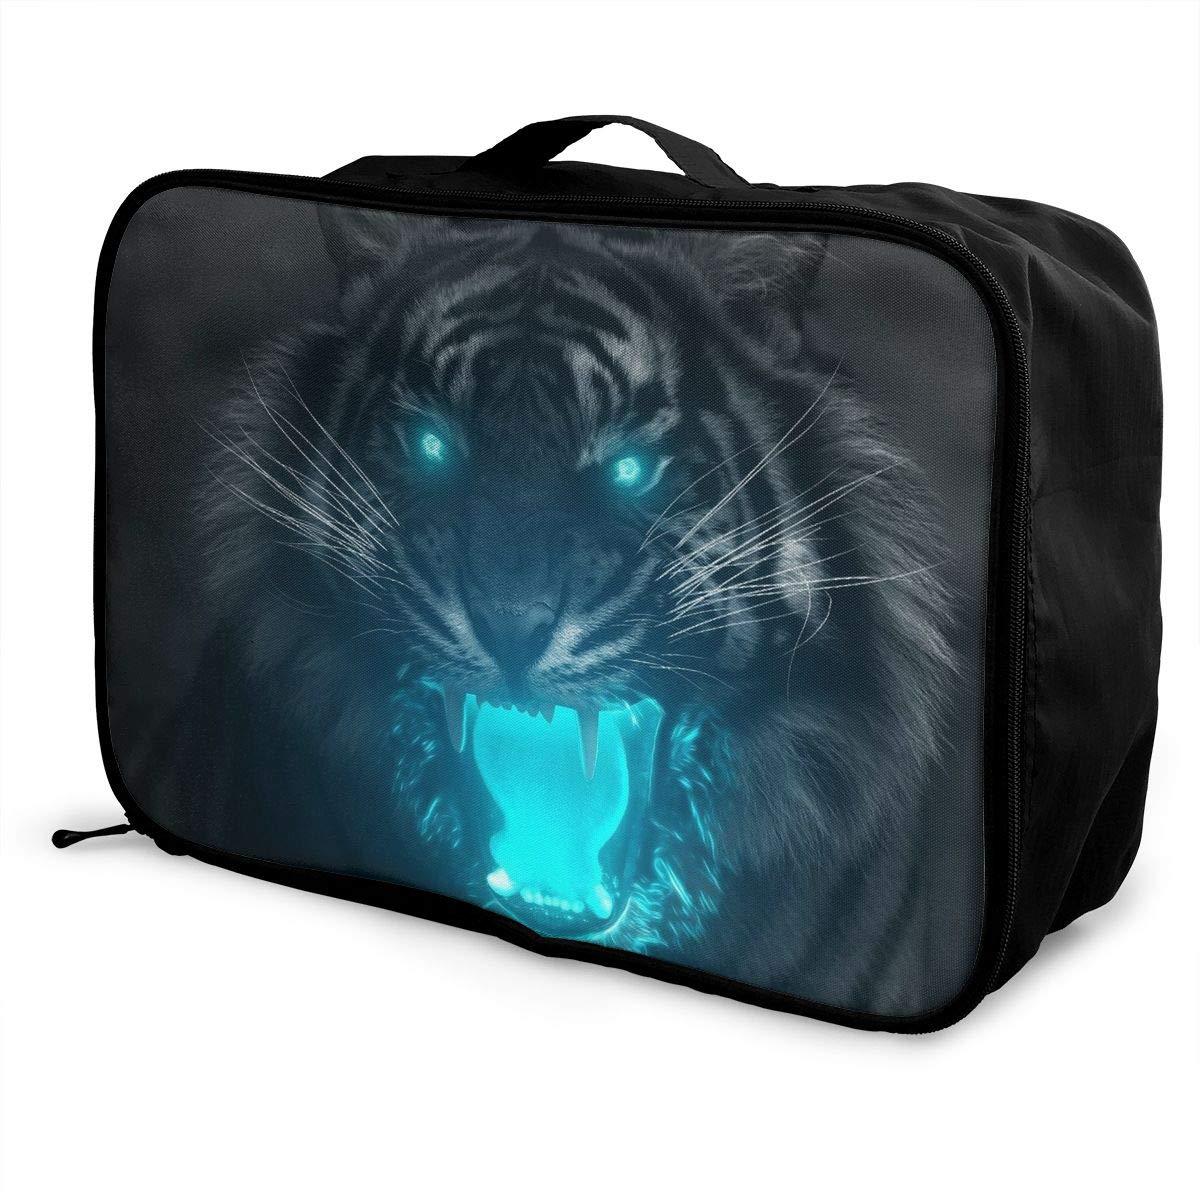 Travel Luggage Duffle Bag Lightweight Portable Handbag Fantasy Tiger Large Capacity Waterproof Foldable Storage Tote